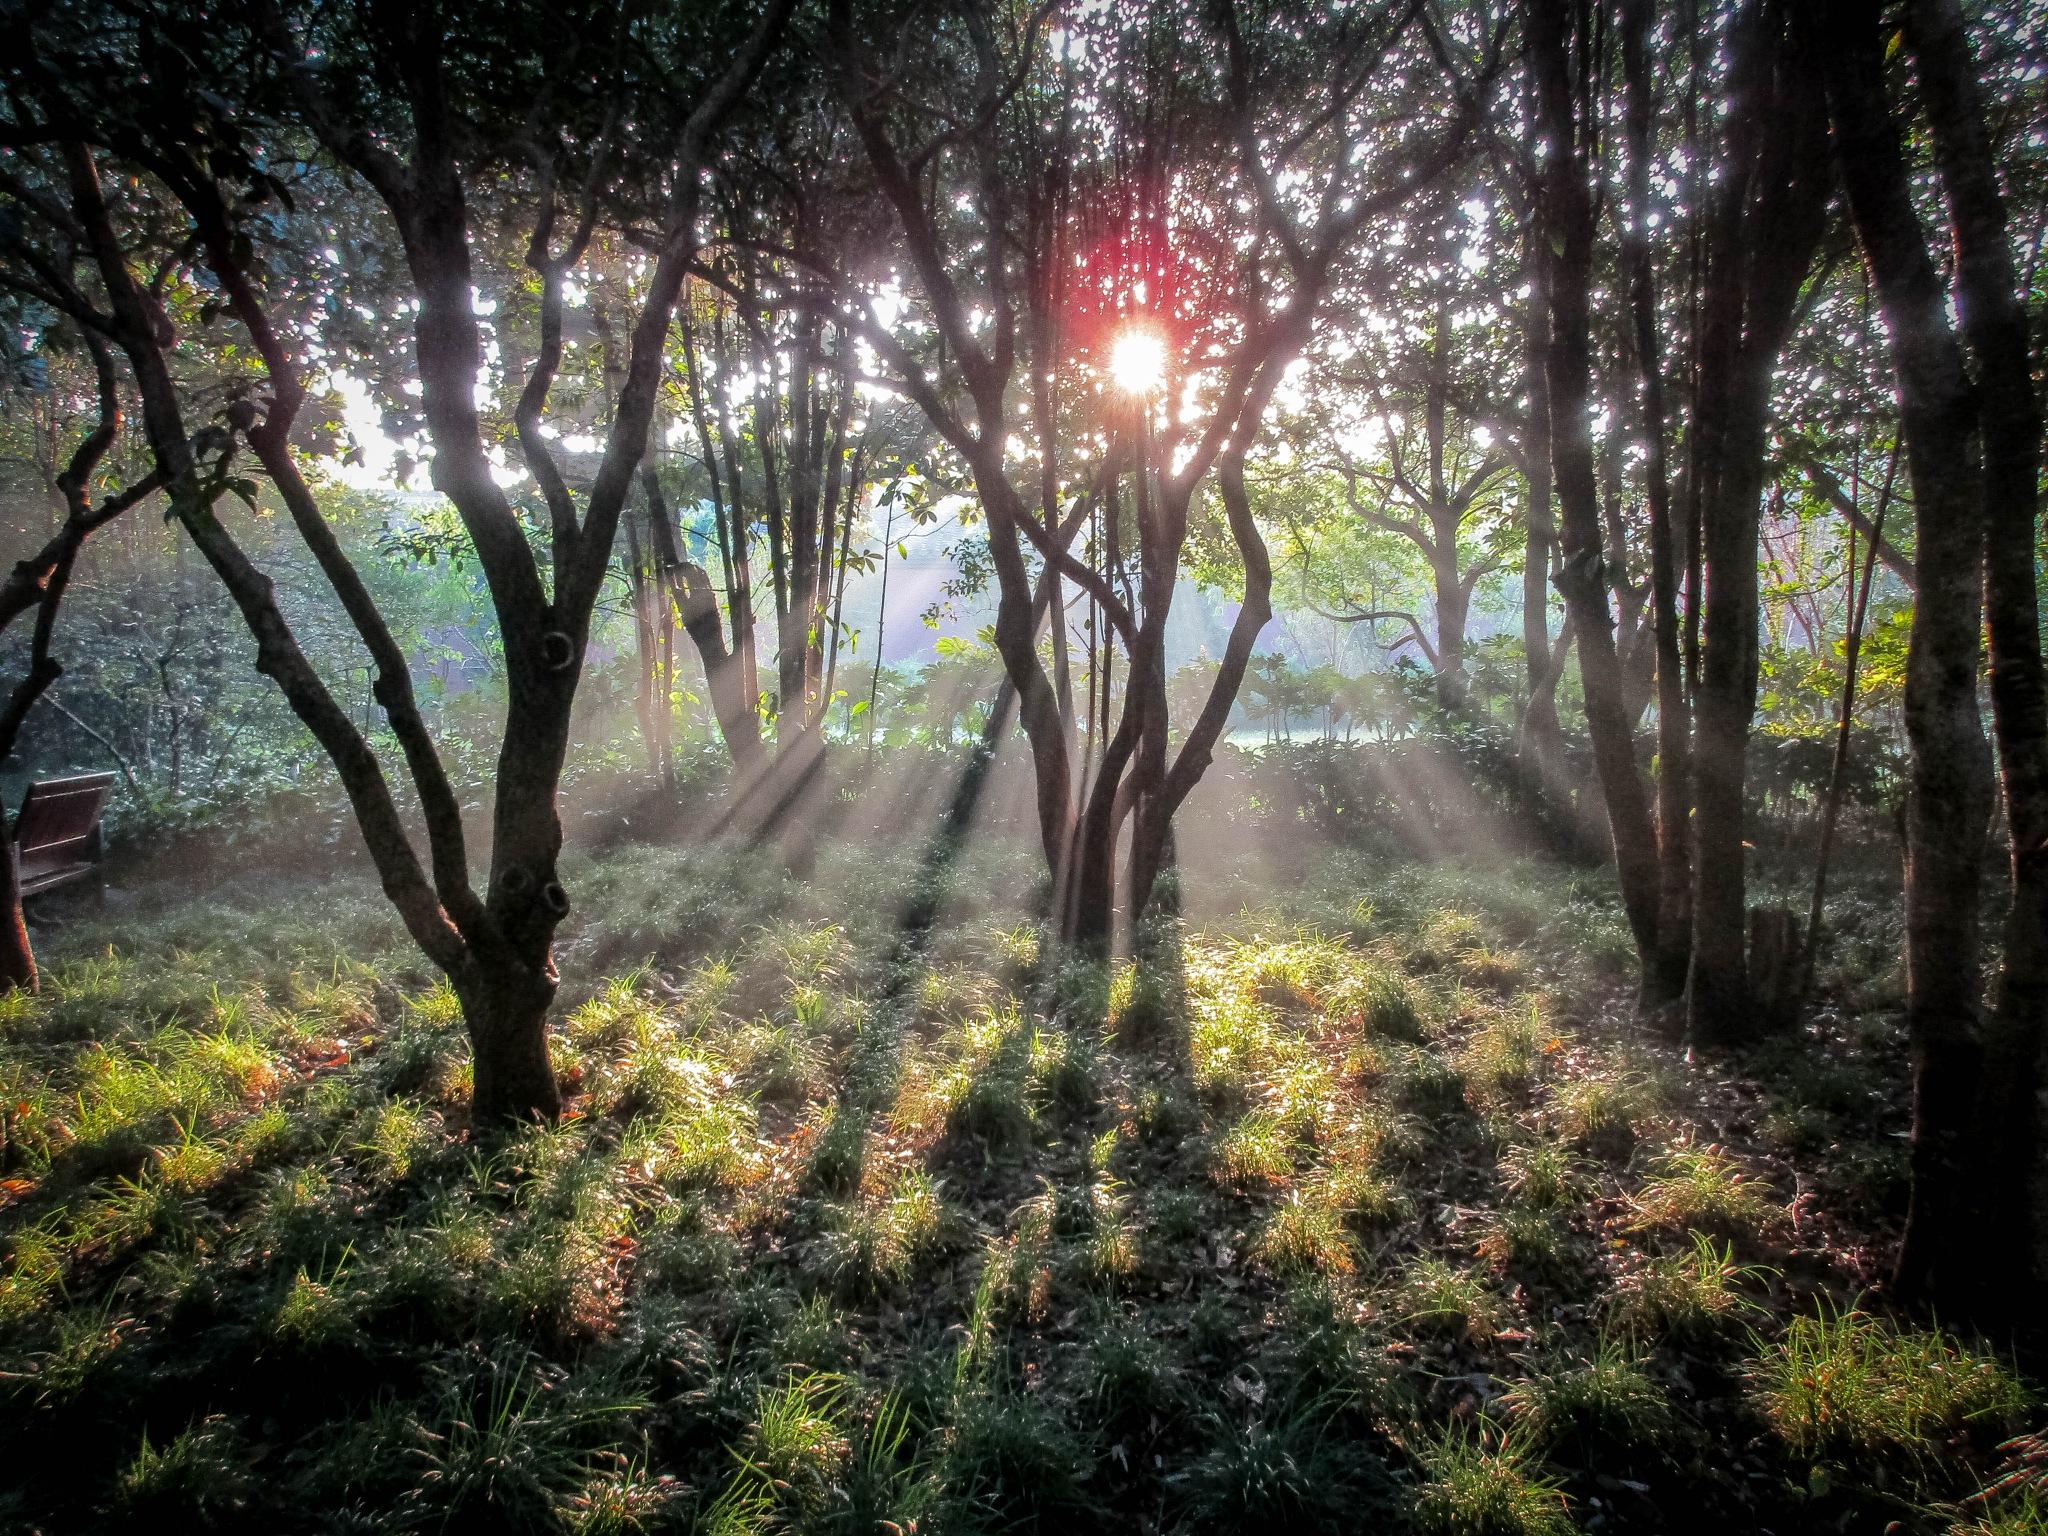 Morning Light  by Robert Borden